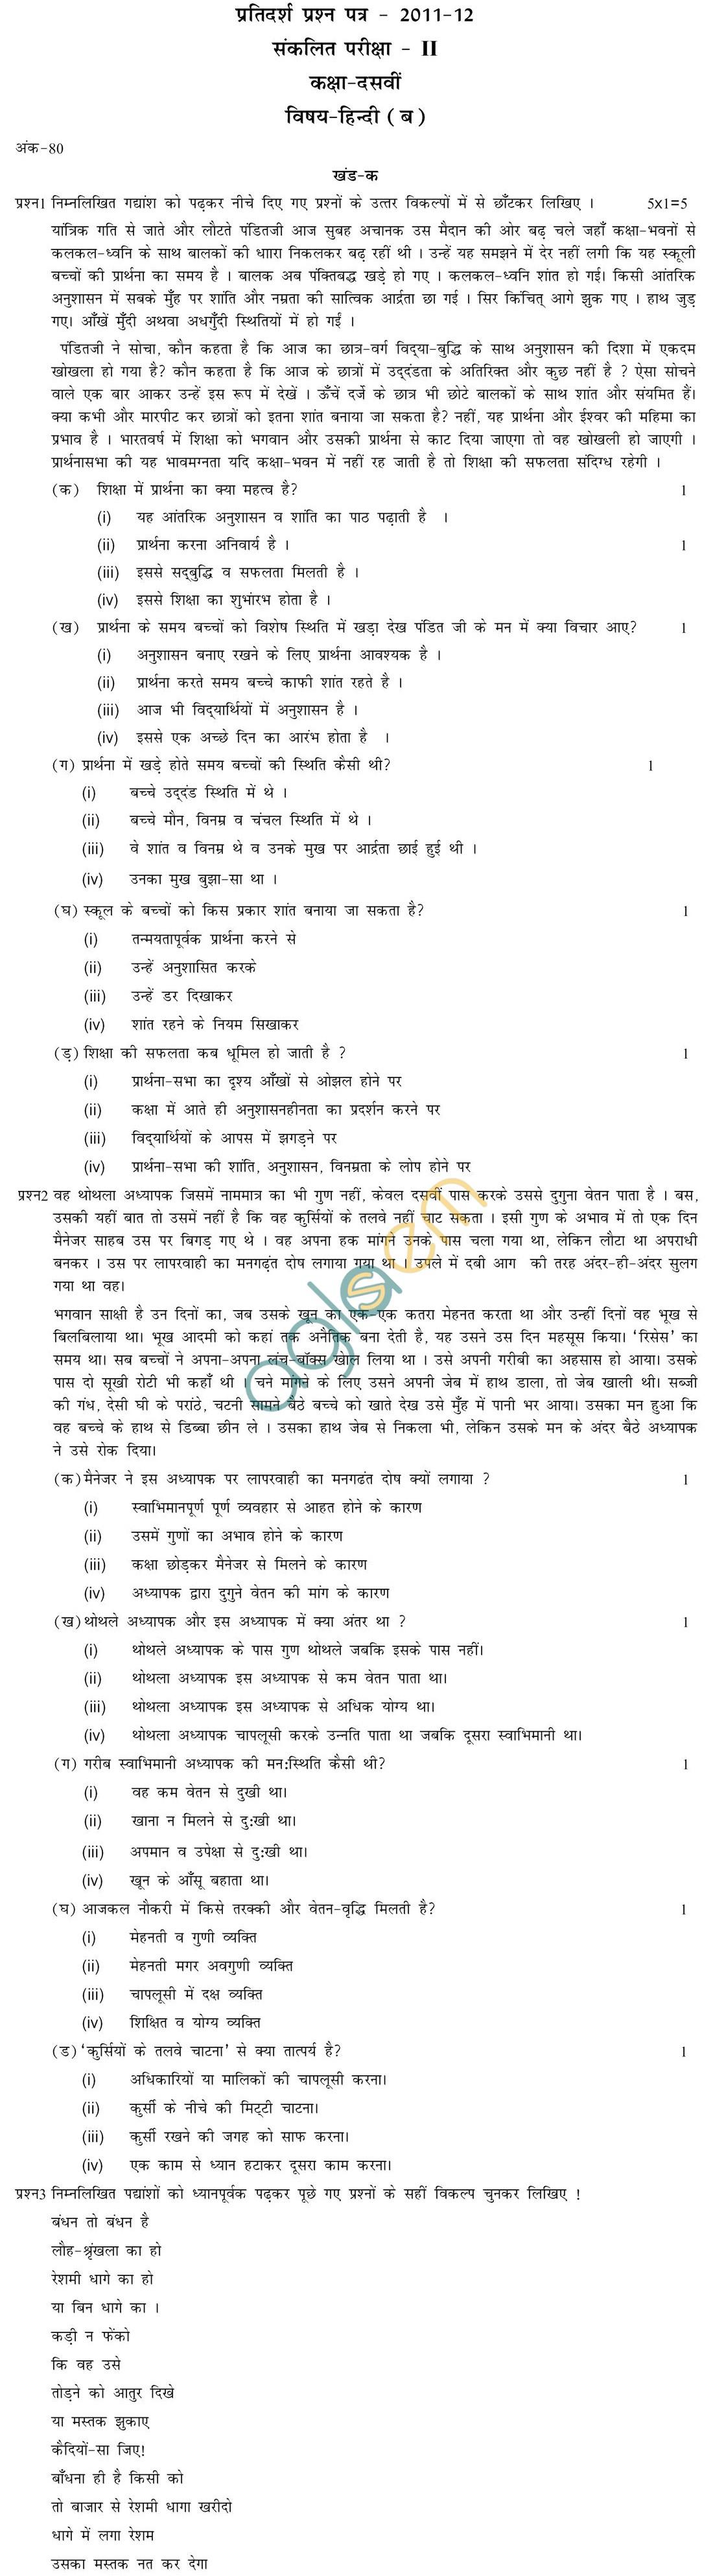 CBSE Board Exam 2013 Sample Papers (SA2) Class X - Hindi – B